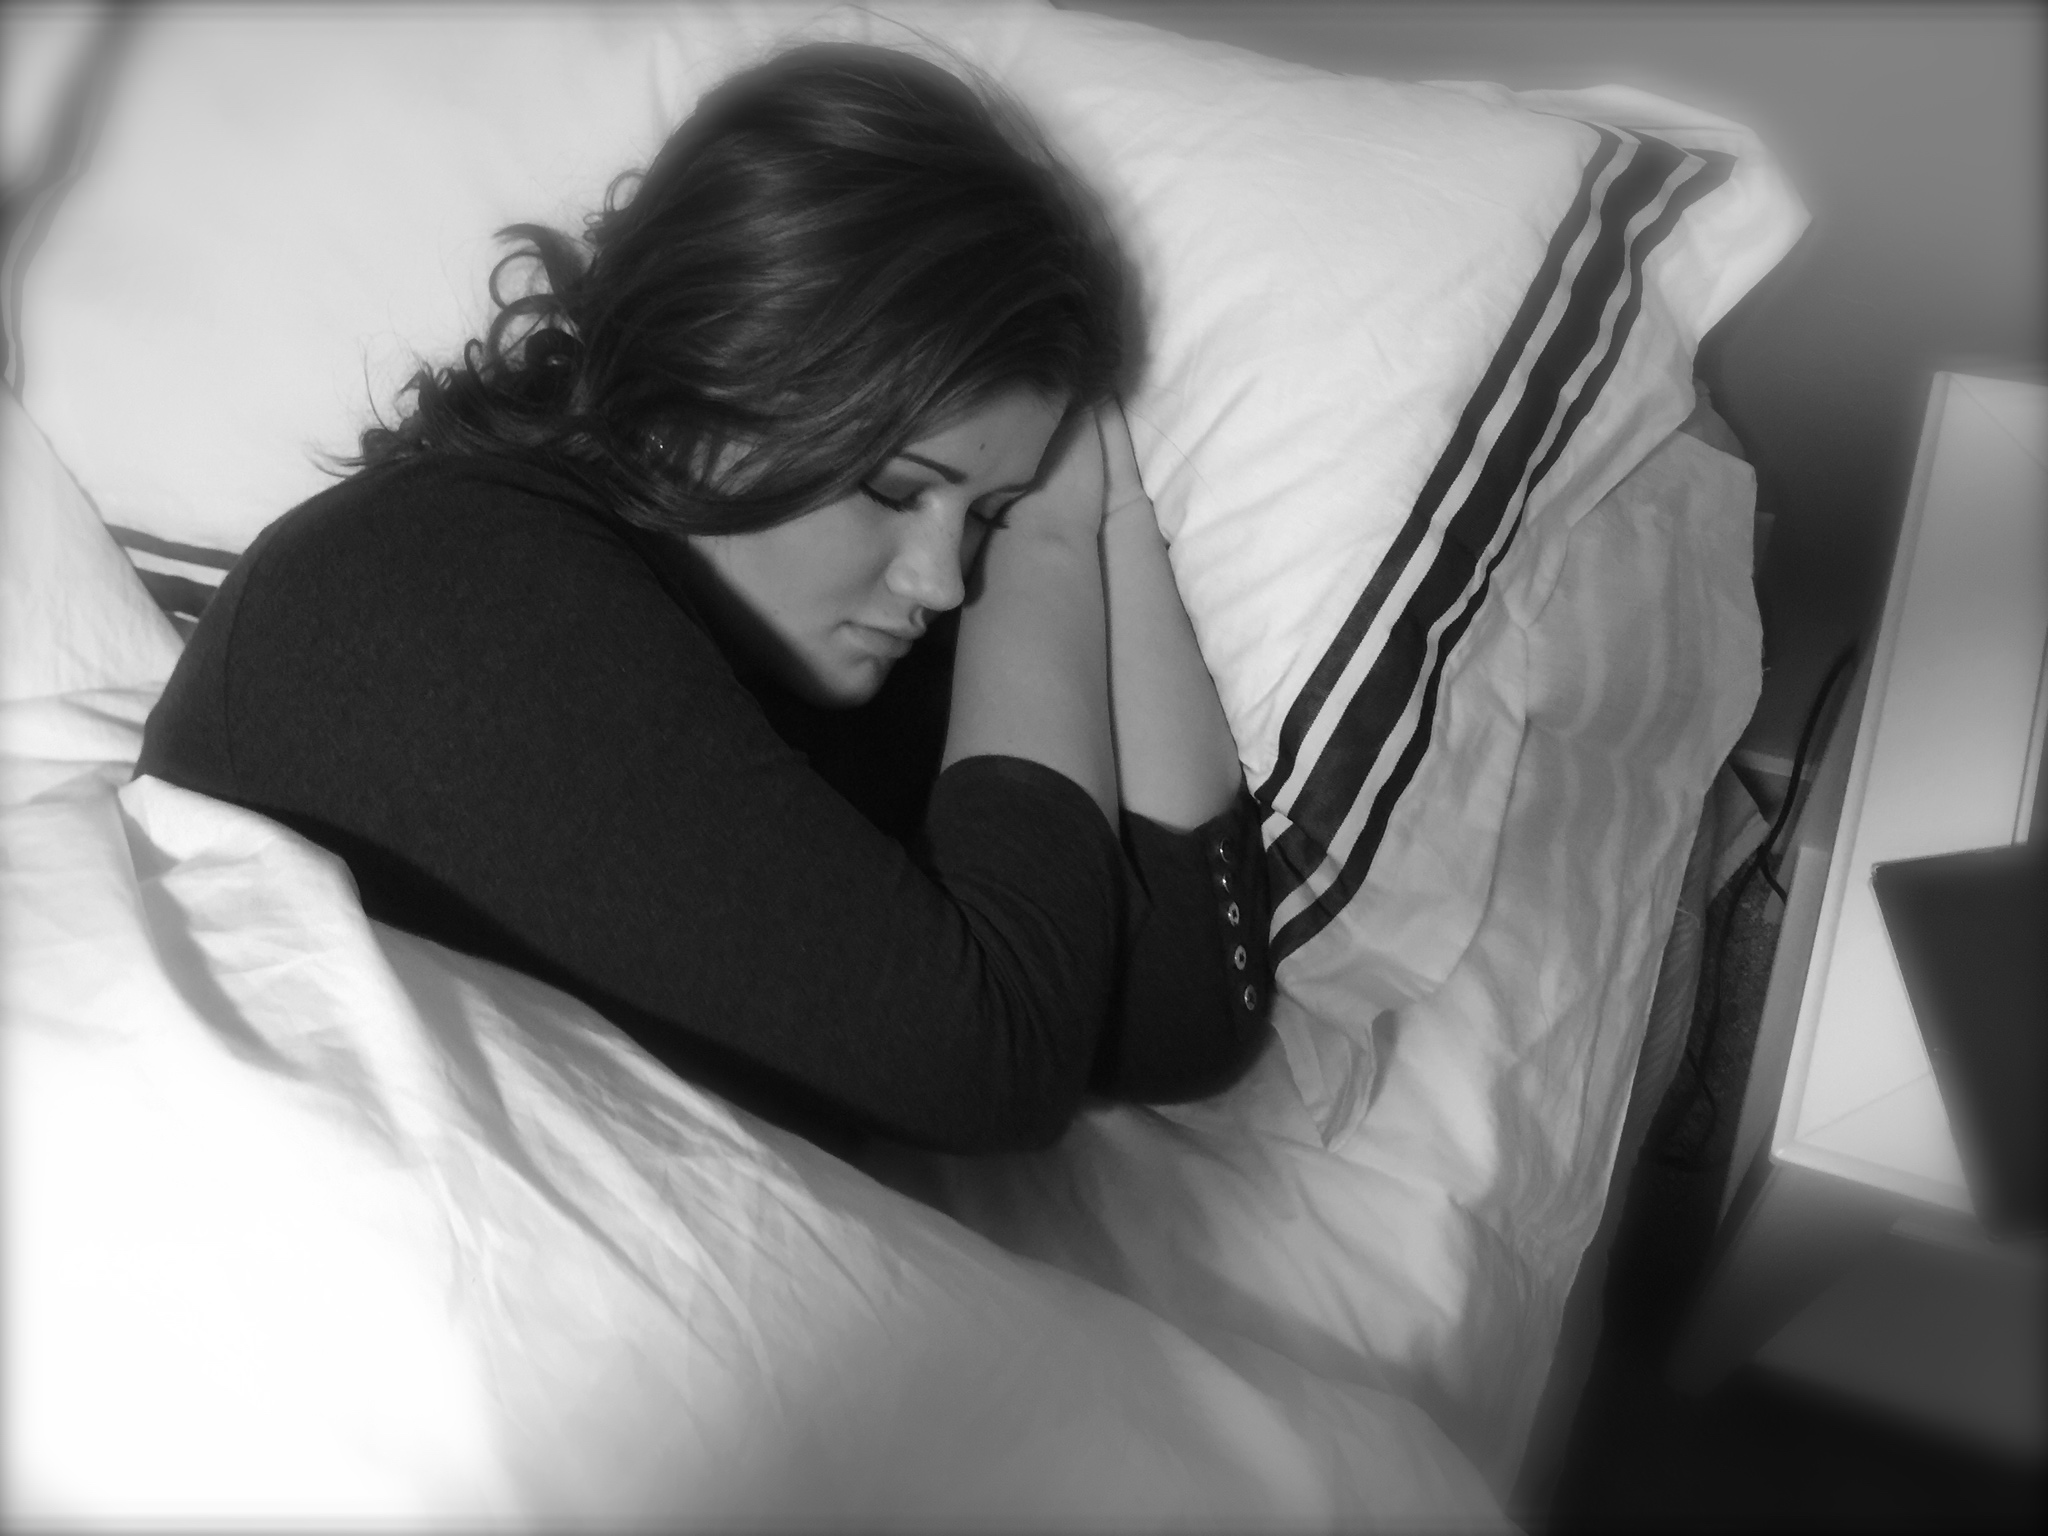 FND Sleep Survey